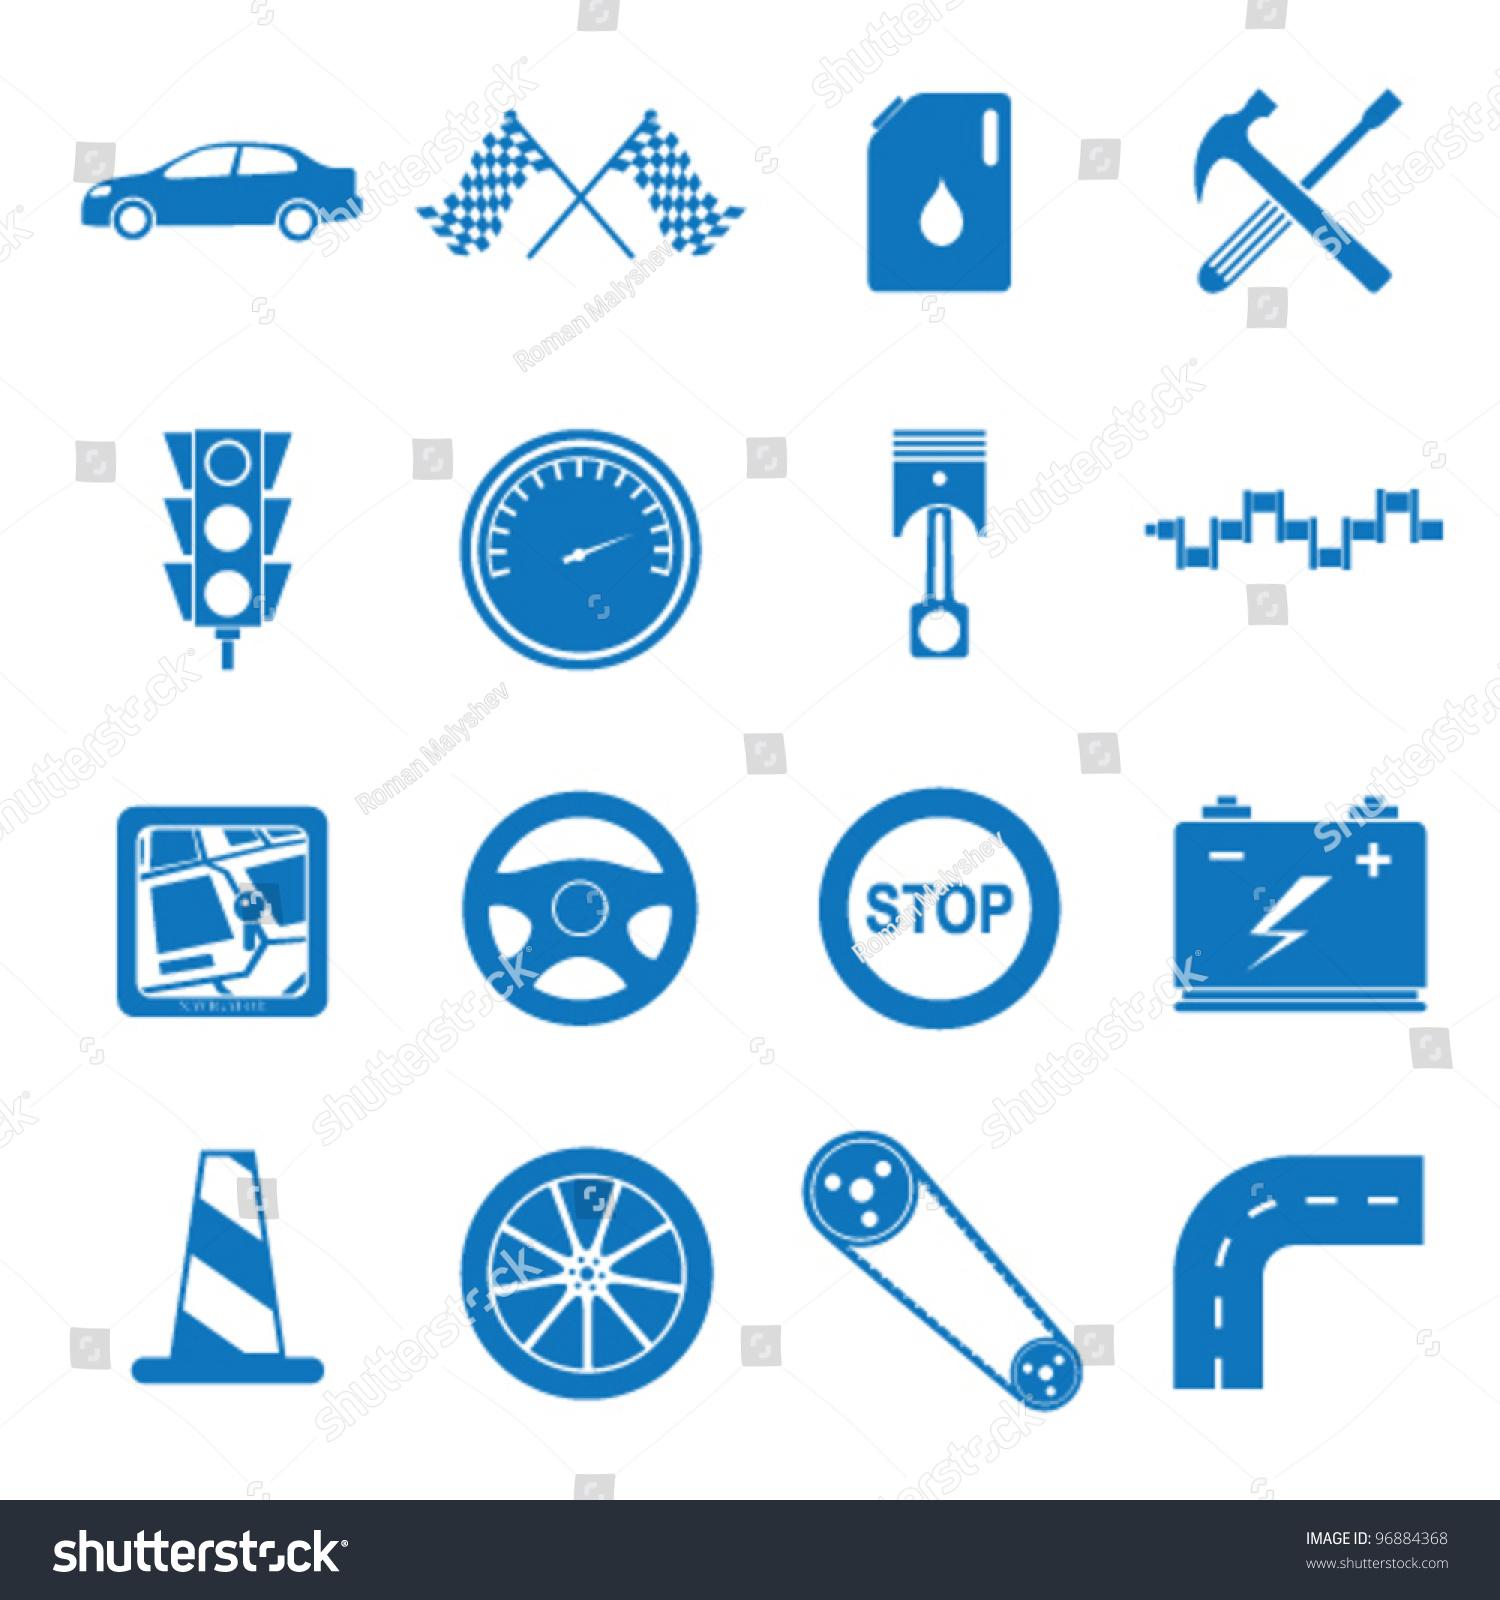 logo logo 标识 标志 设计 矢量 矢量图 素材 图标 1500_1600